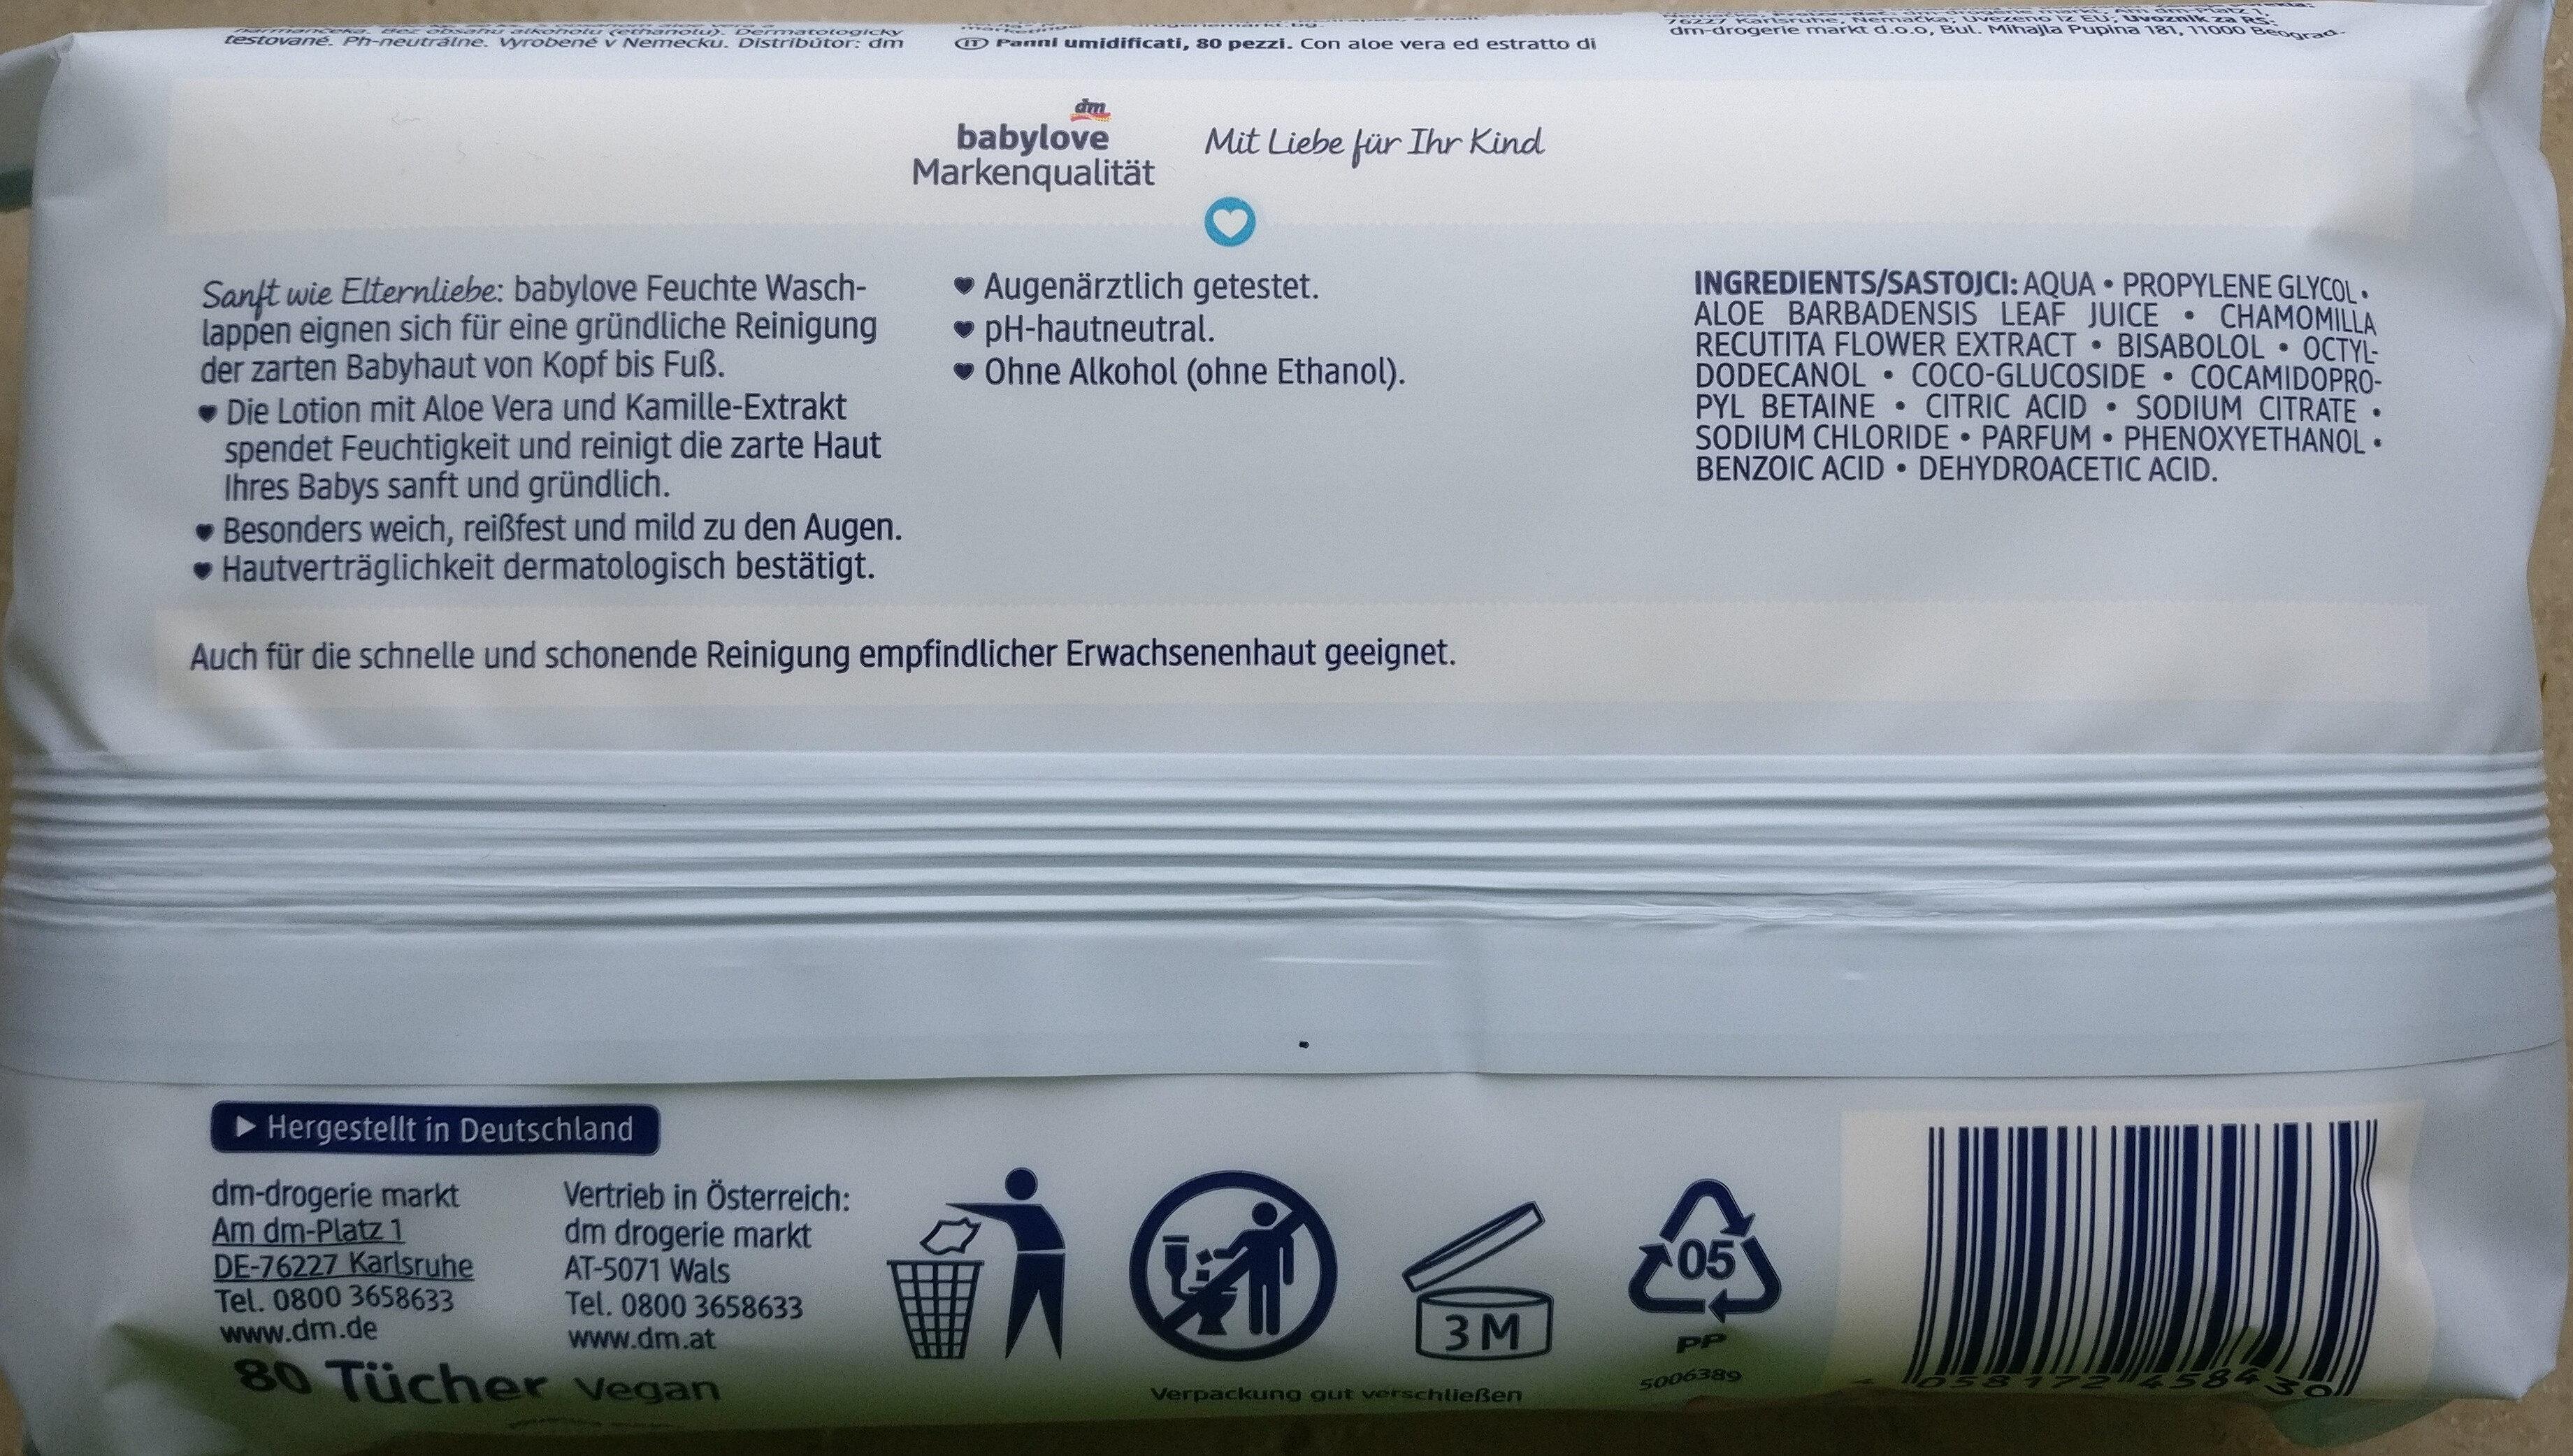 Feuchte Waschlappen - Product - en